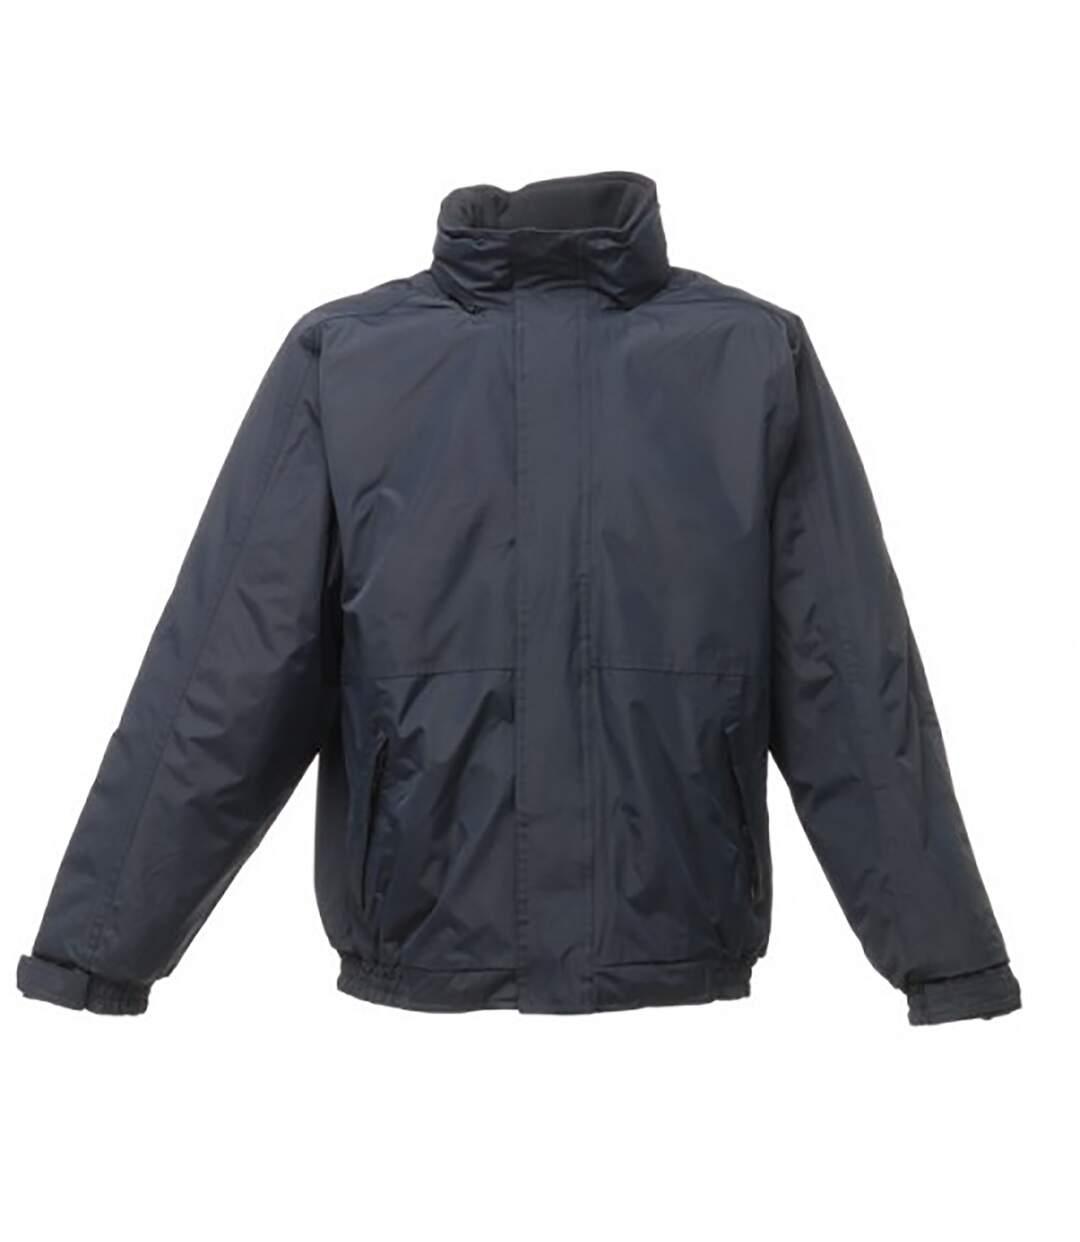 Regatta Dover Waterproof Windproof Jacket (Thermo-Guard Insulation) (Navy/Navy) - UTBC839